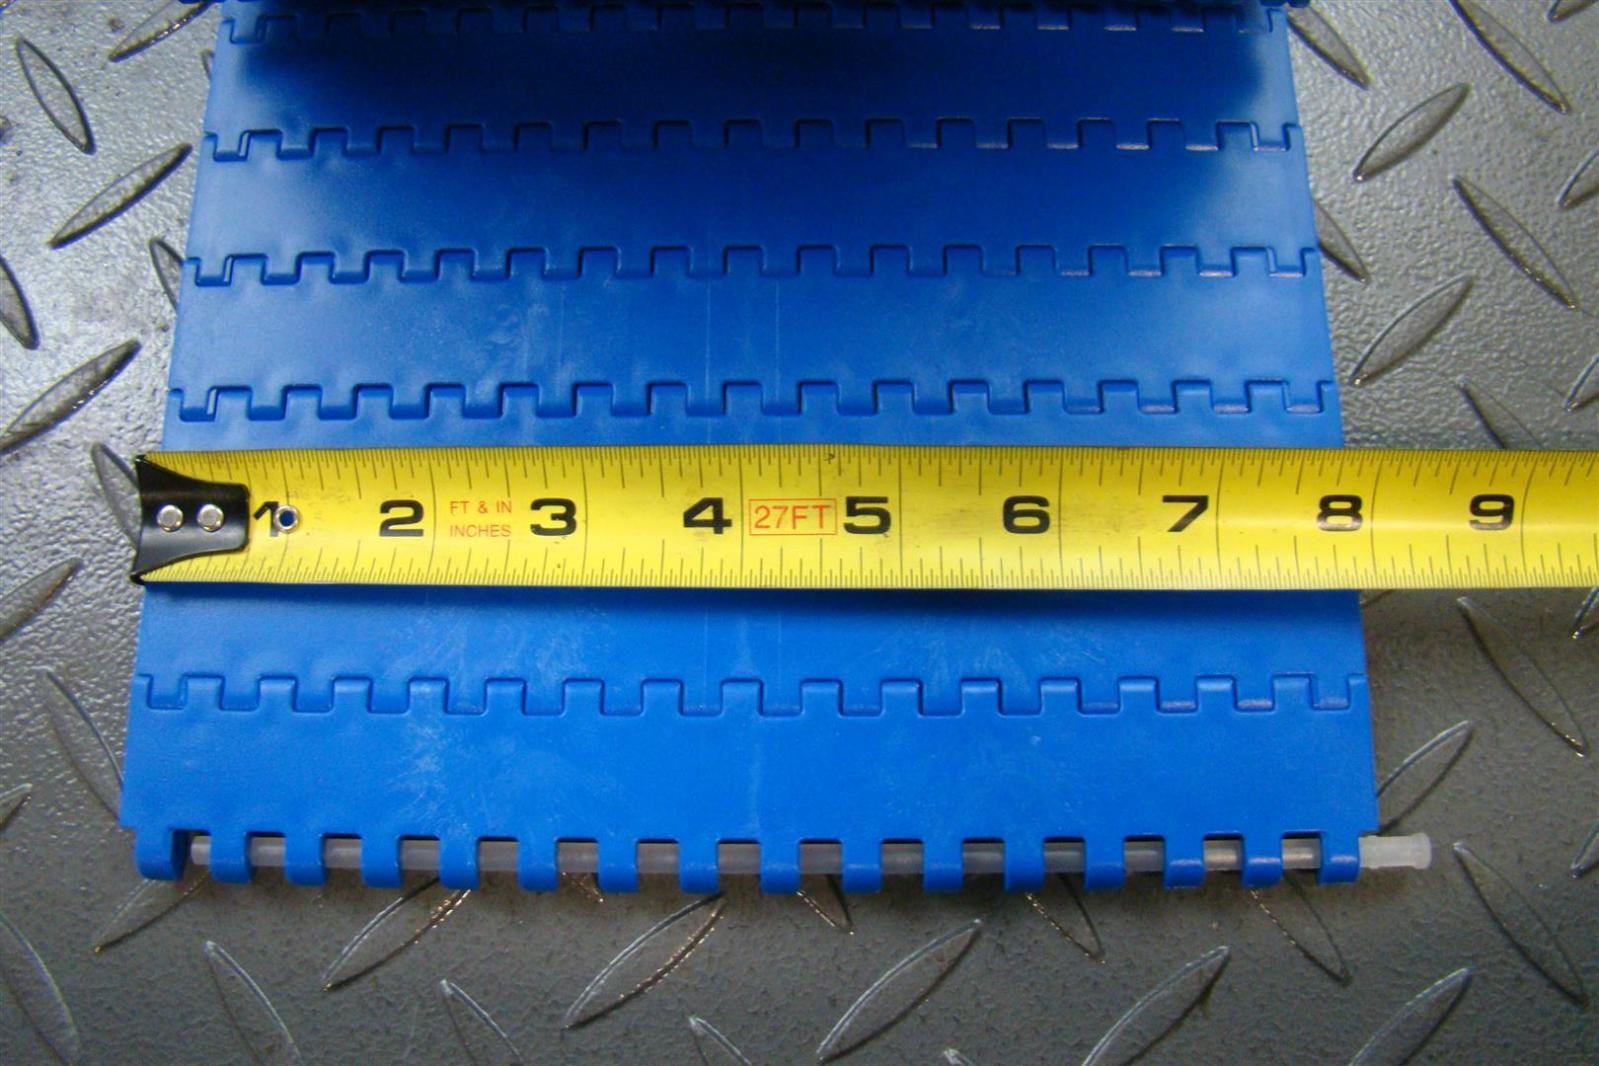 Модульная лента Holzer 2401 Flush Grid шаг 25.4 мм, толщина 12.8 мм, открытость 35%, POM (9000x311 м заказать